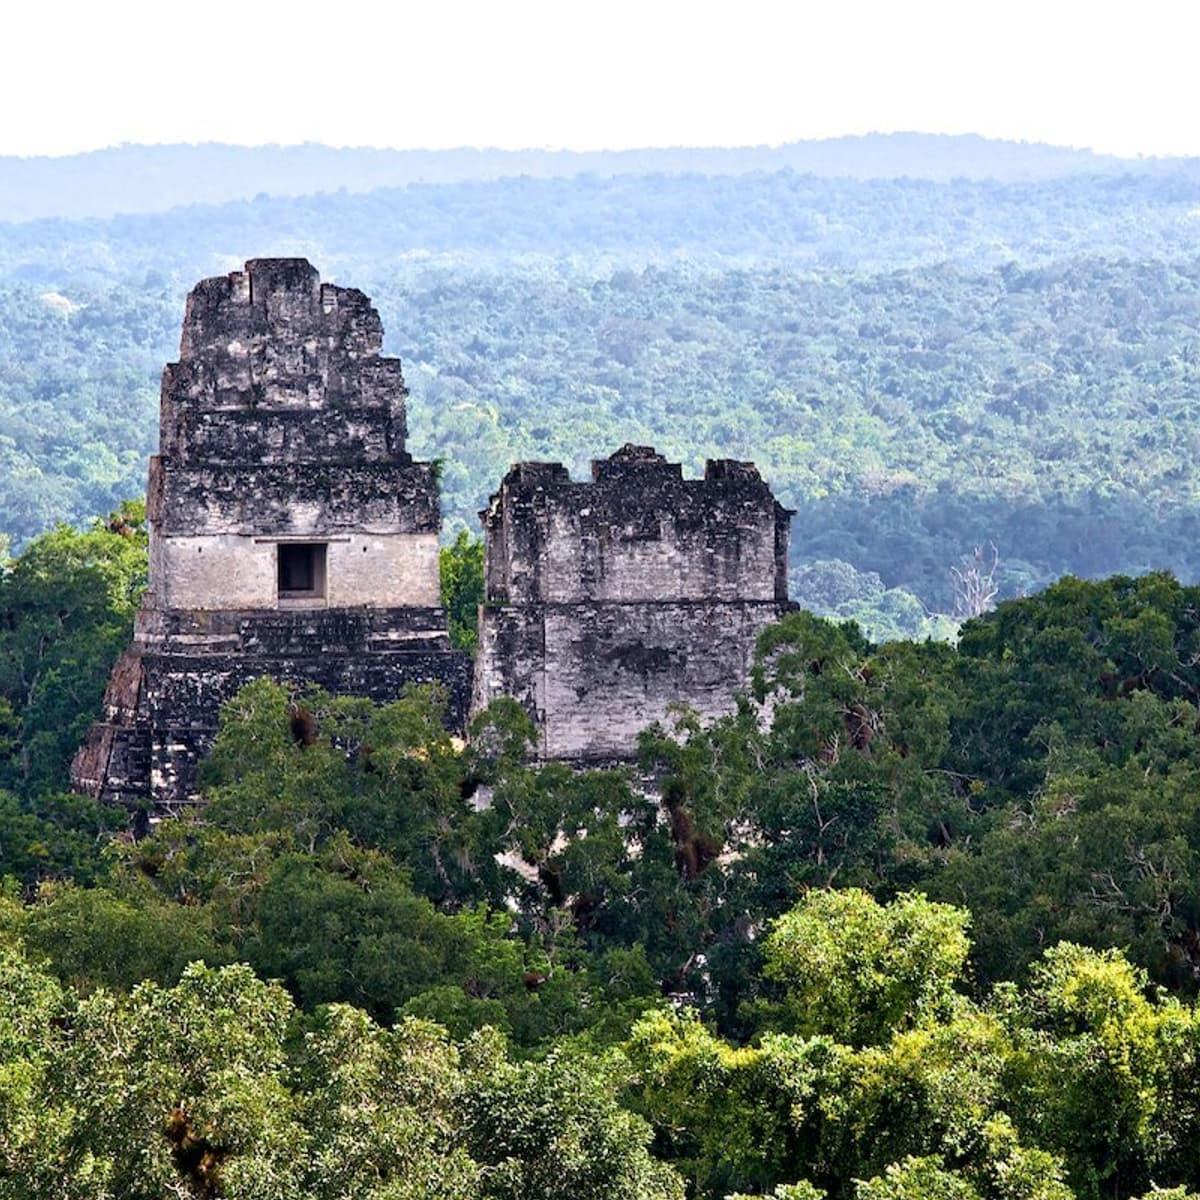 Tikal Mayan Ruins Jungle view from custom Guatemala tour